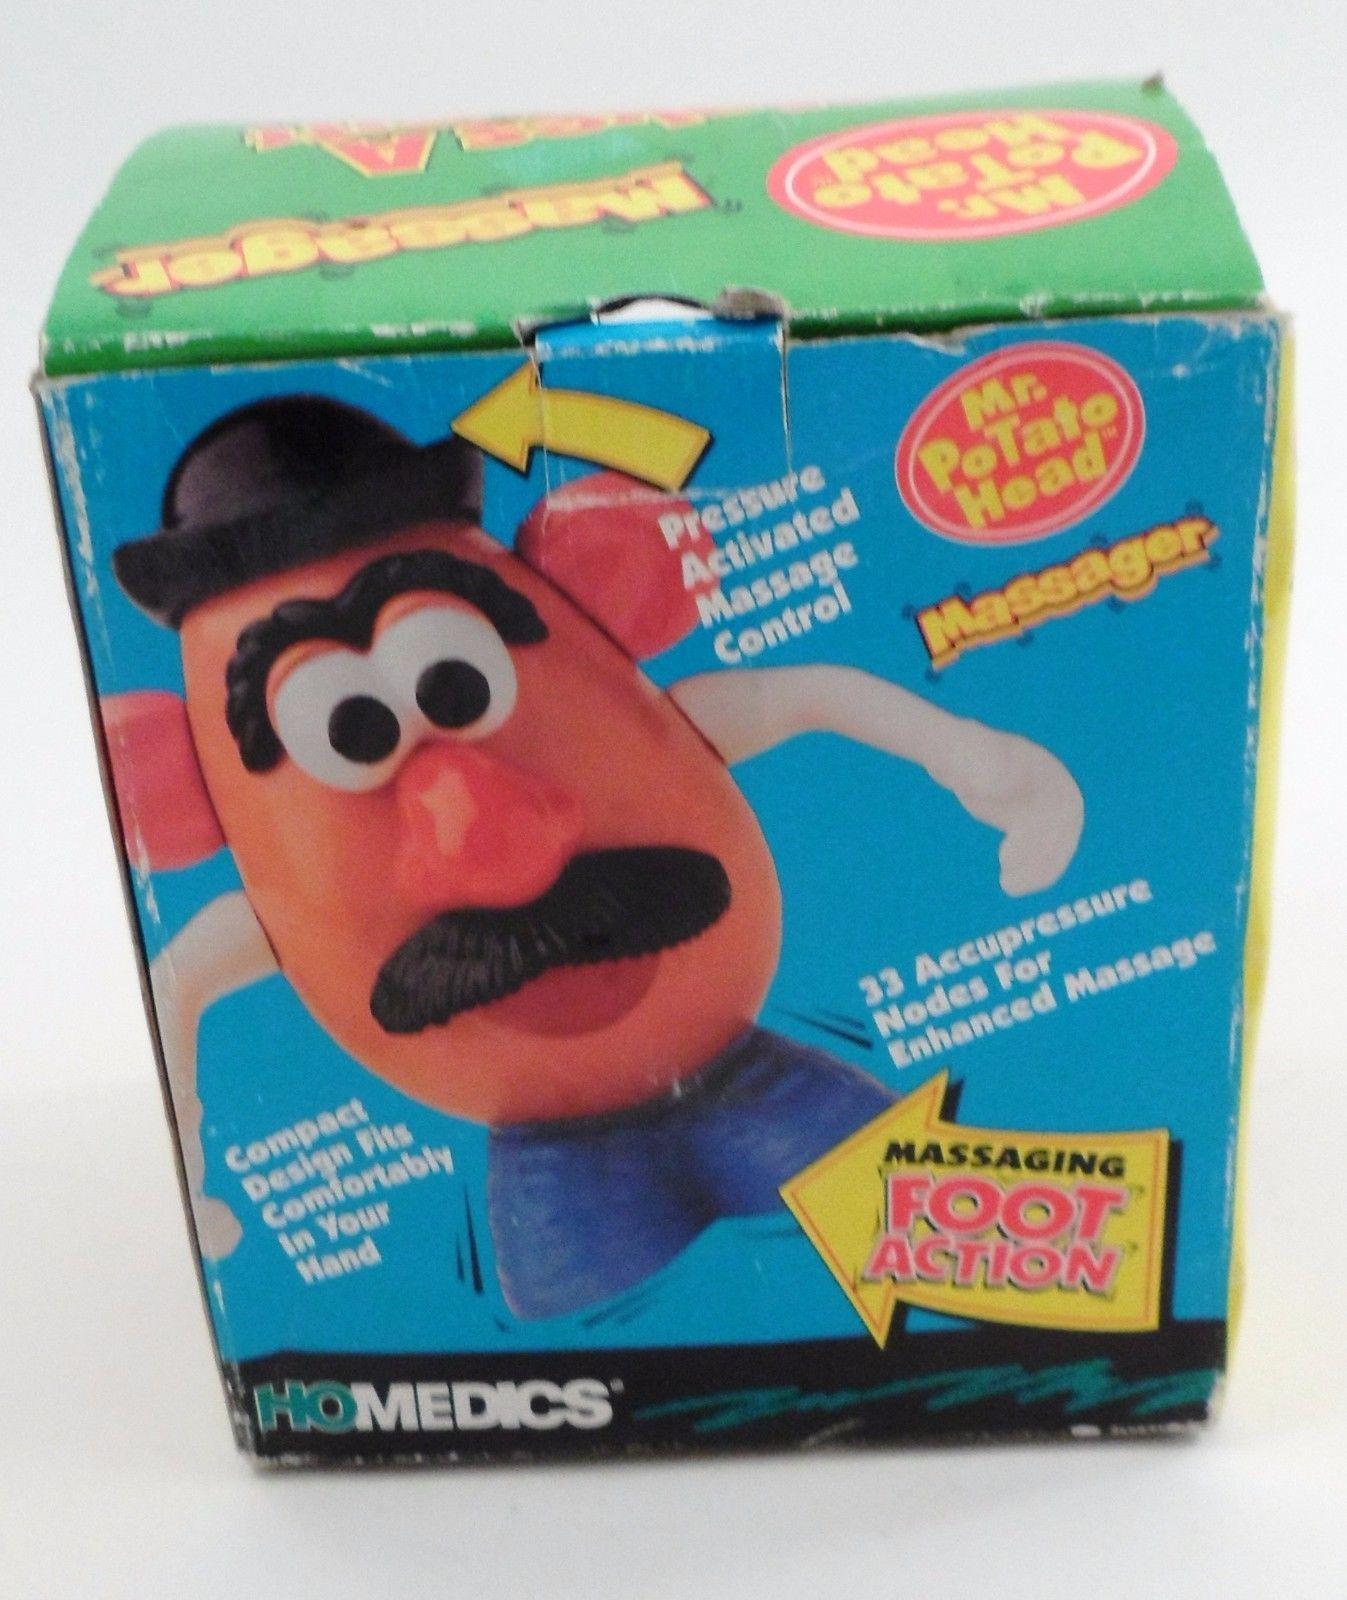 MIB 1996 Homedics Hasbro Toy Story Mr Potato Head Massager Massaging Foot Action